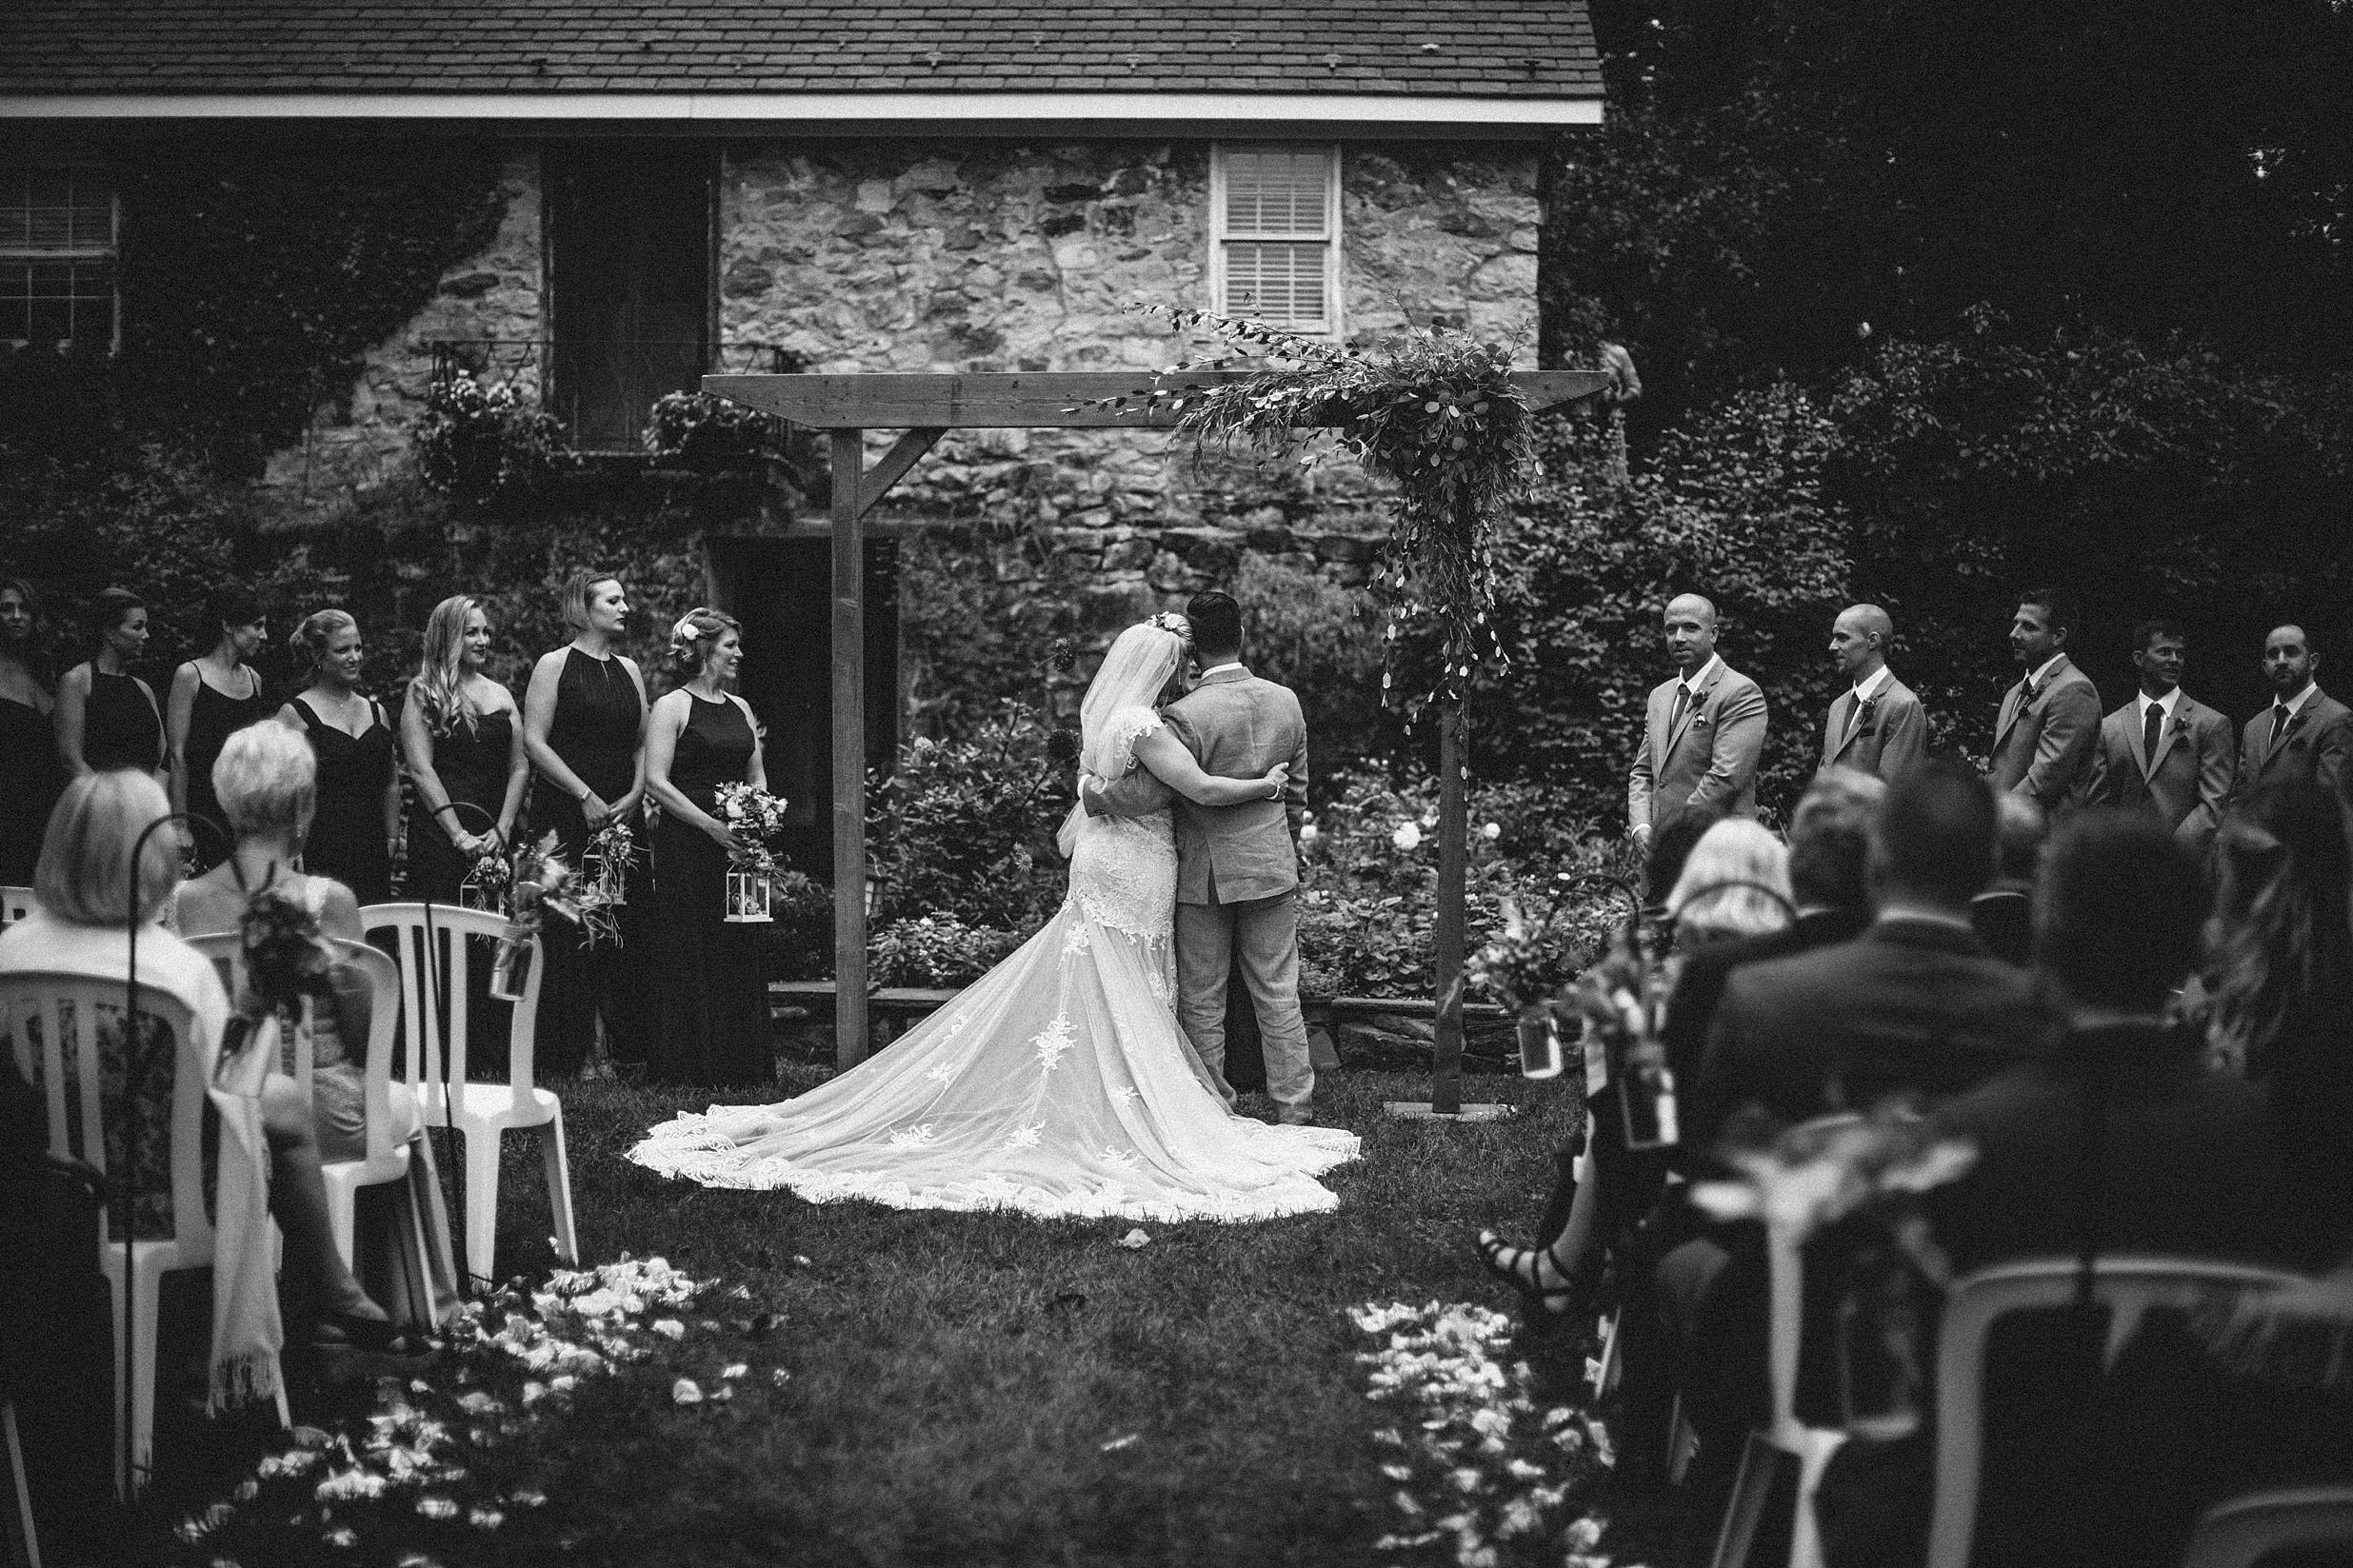 crossed-keys-outdoor-ceremony-camp-wedding-photo_0039.jpg